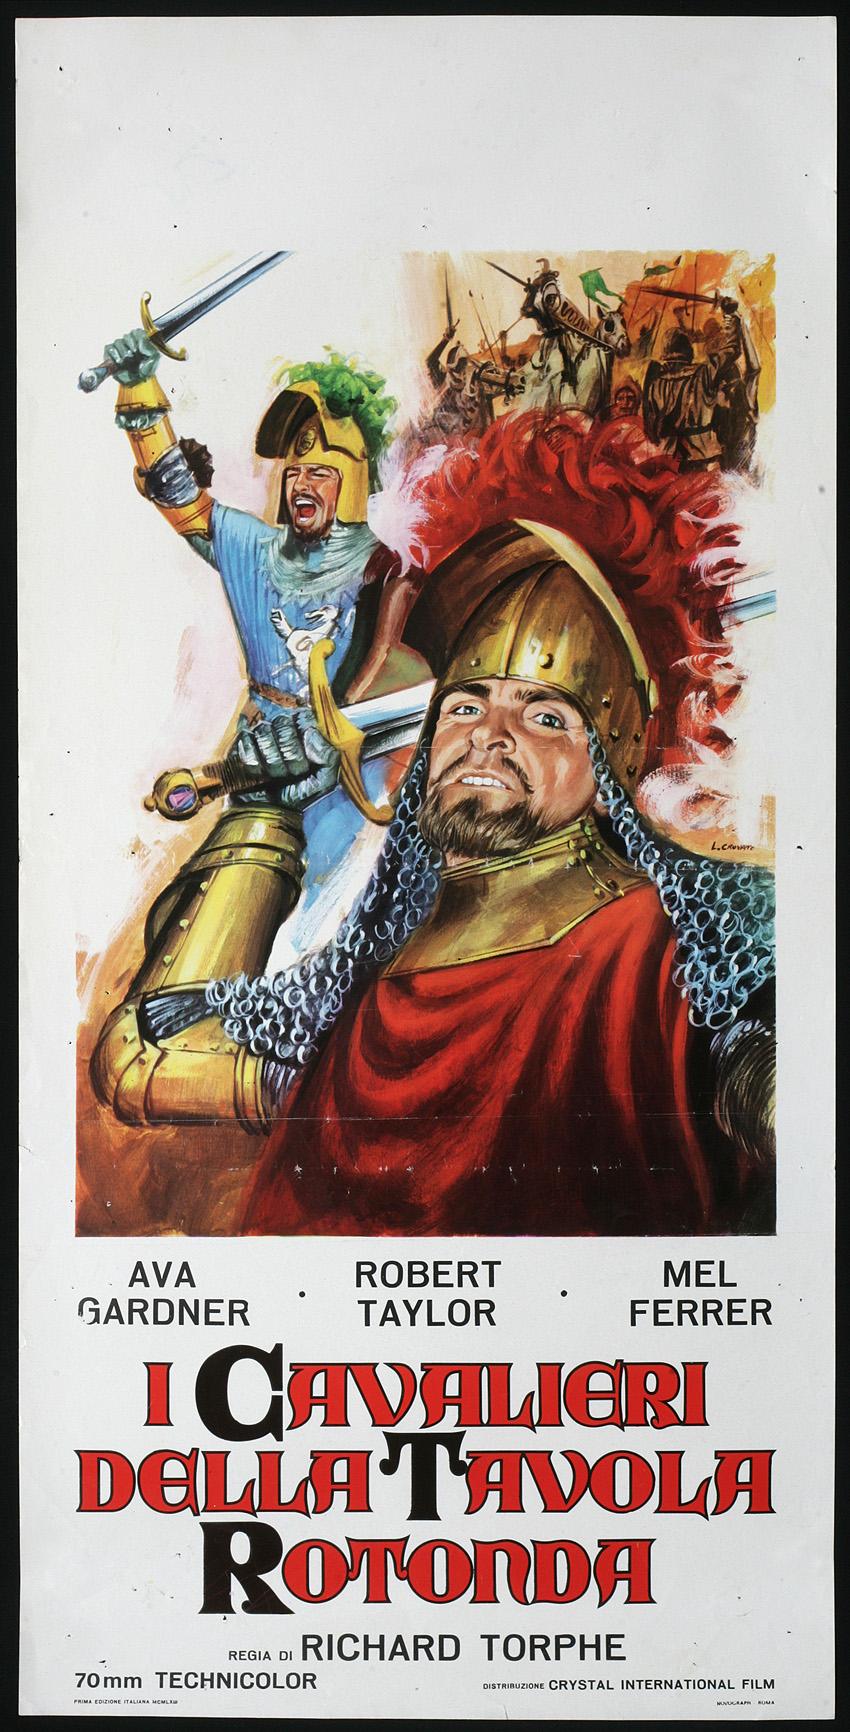 Cinema locandina cavalieri della tavola rotonda gardner ebay - I cavalieri della tavola rotonda film ...